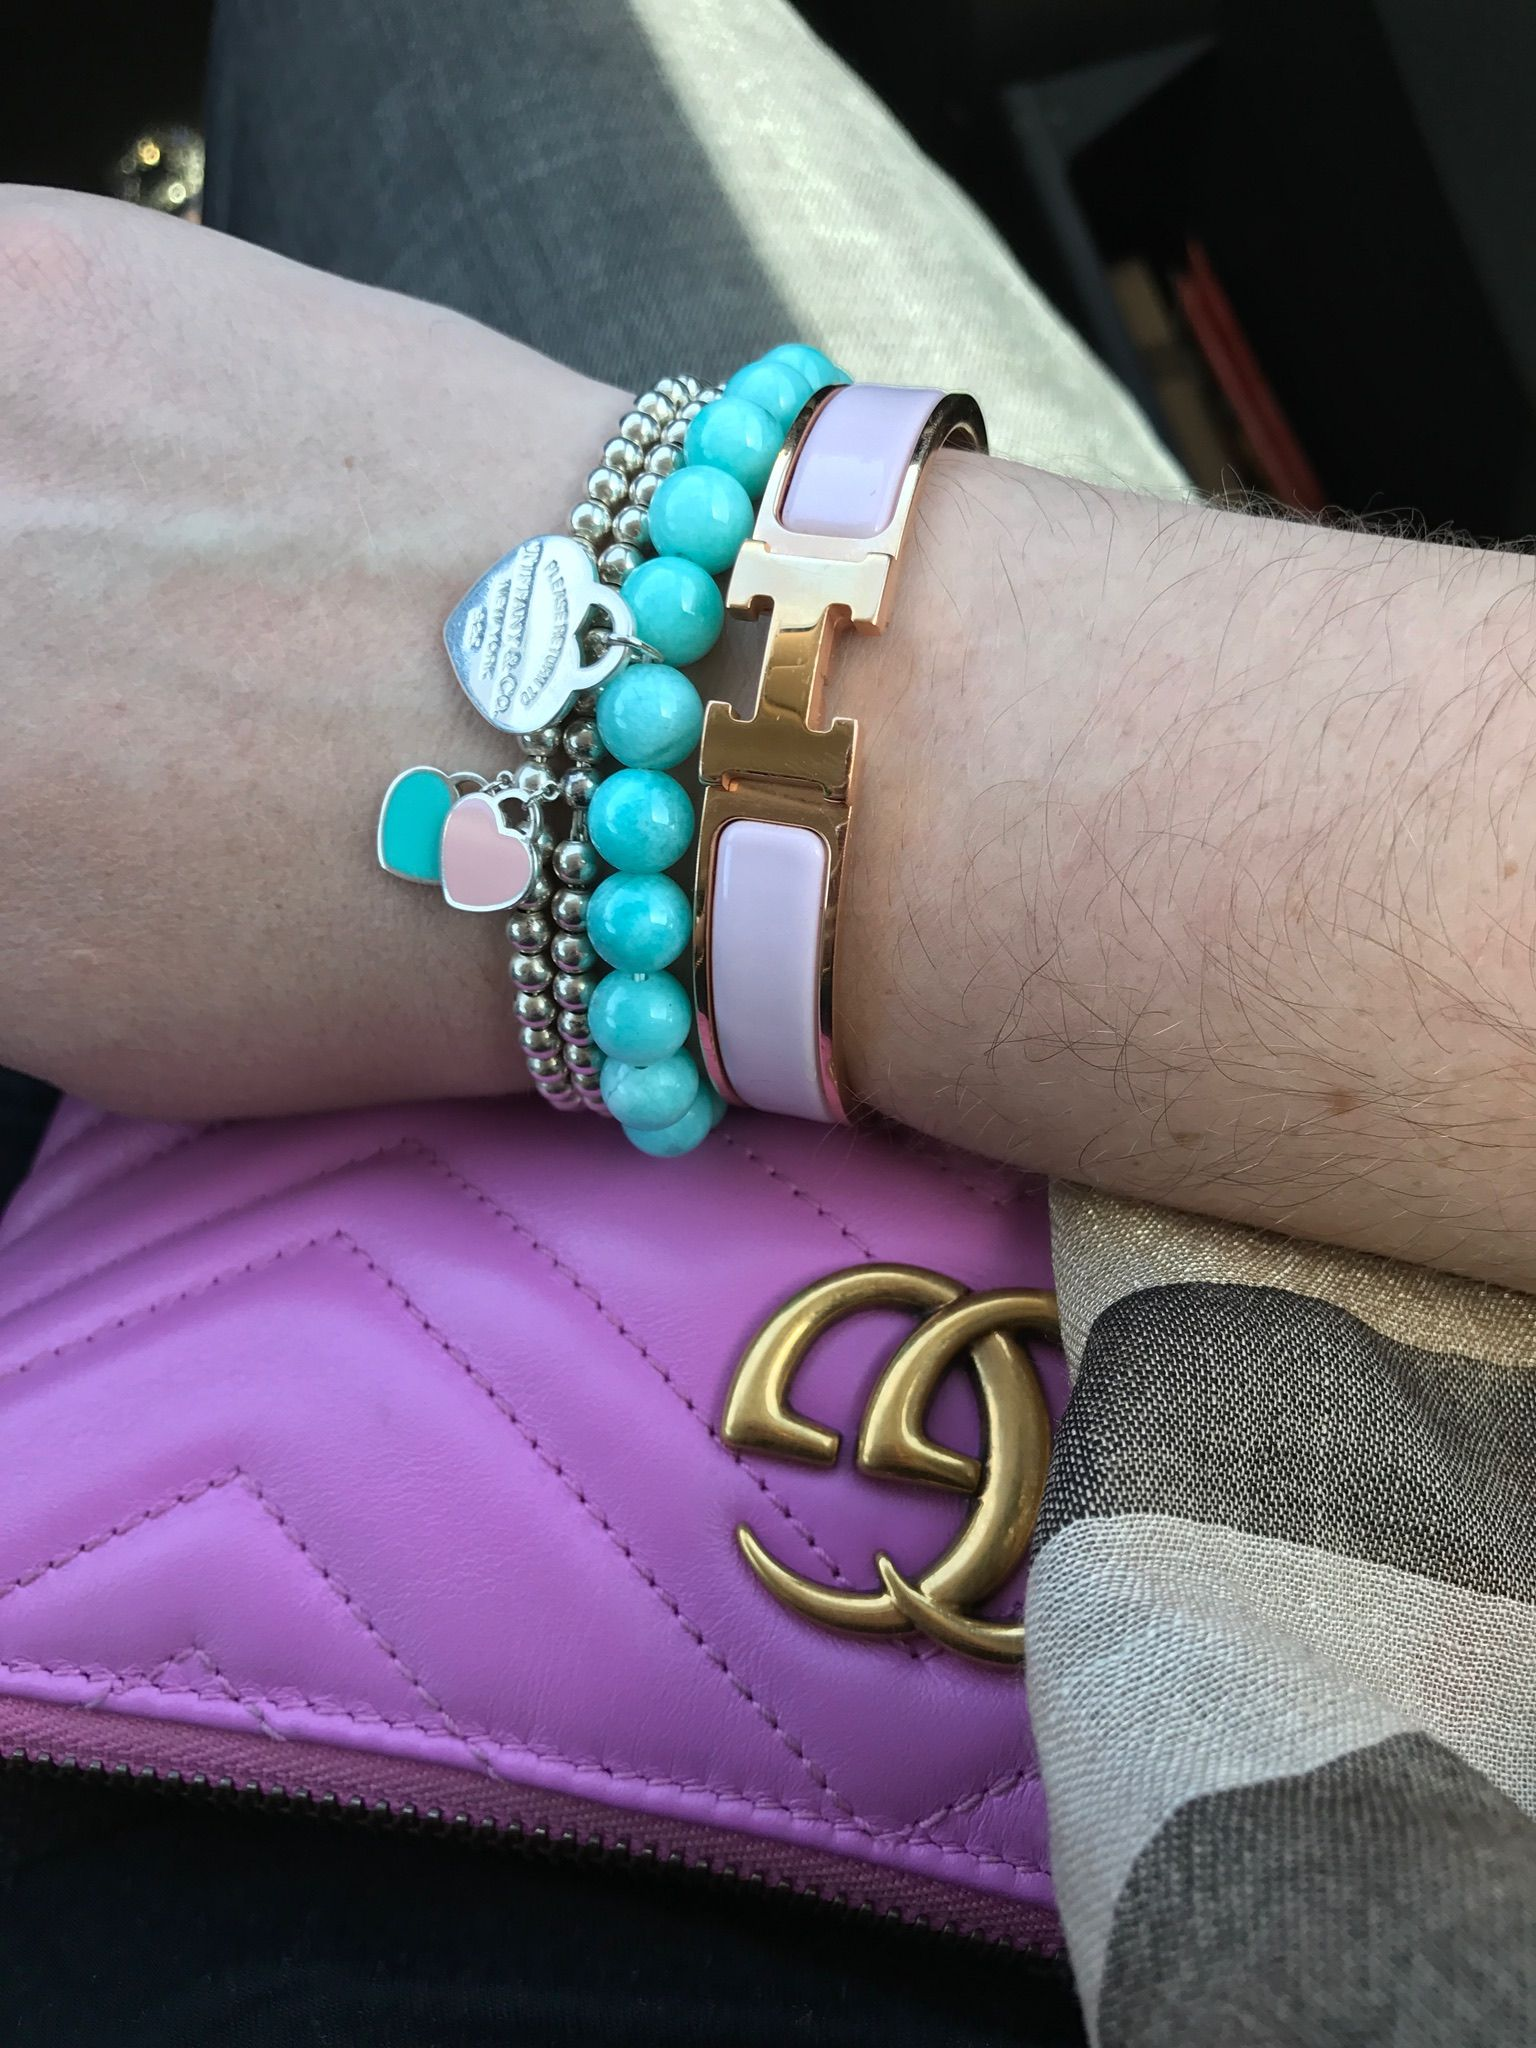 Tiffany Heart Bracelet >> Tiffany bead bracelet stack, Tiffany blue beads, Hermes pink clic clac, pink Gucci crossbody ...